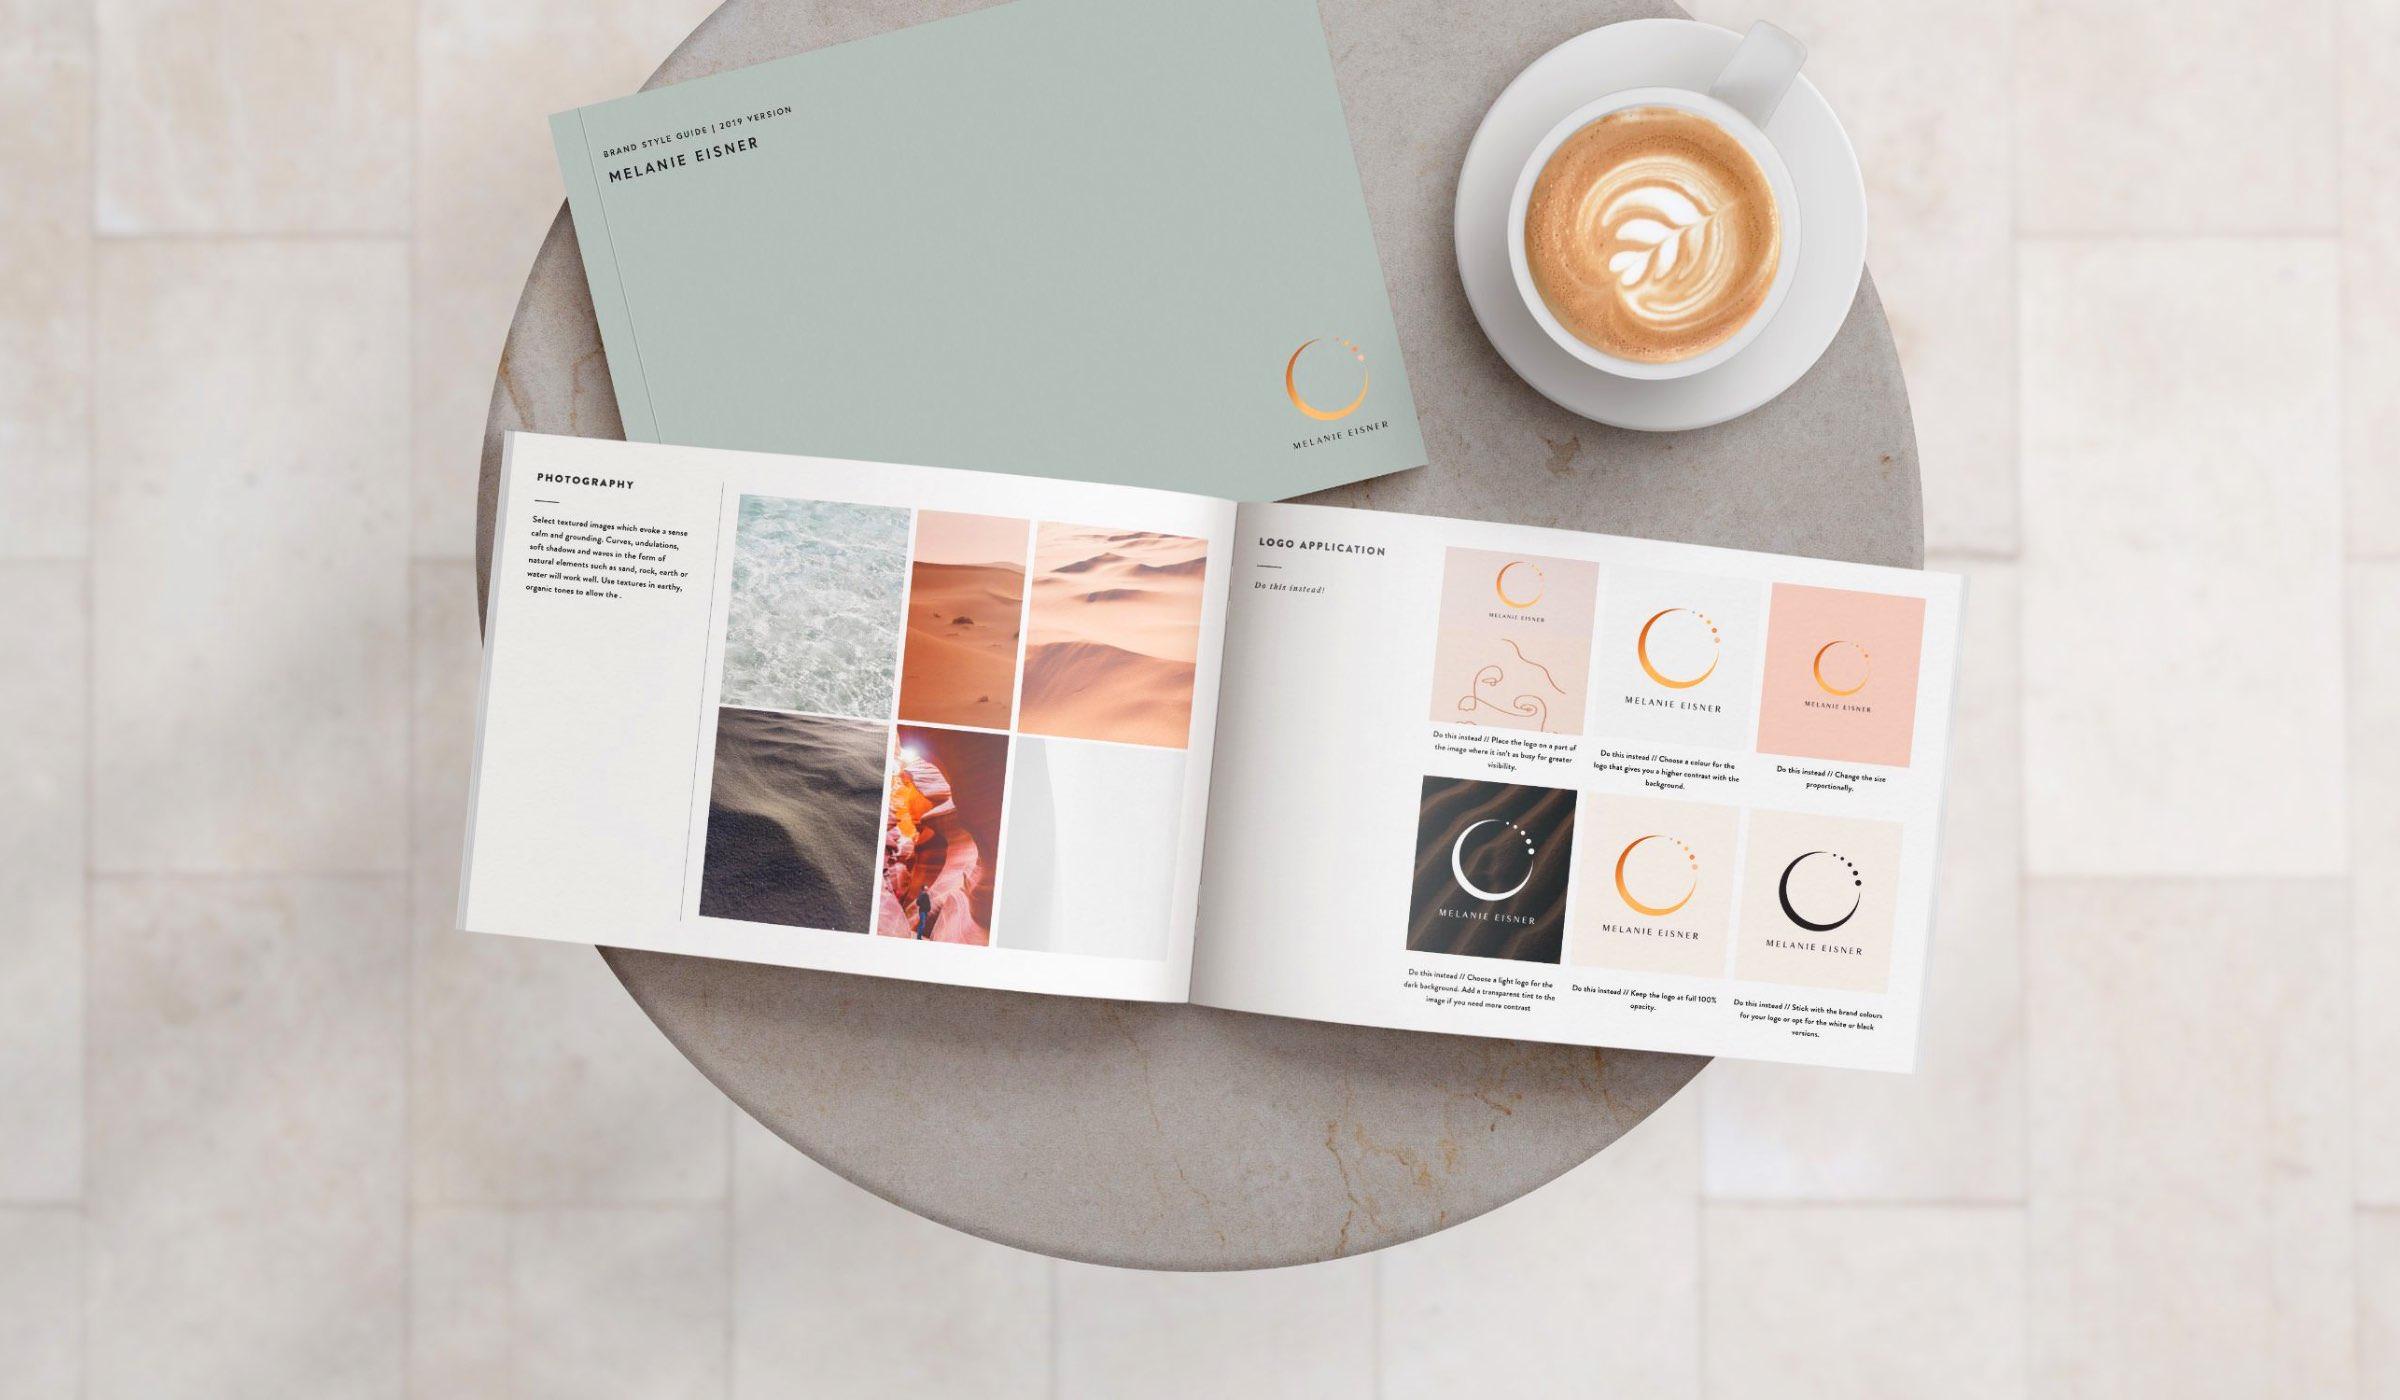 Melanie Eisner brand style guide